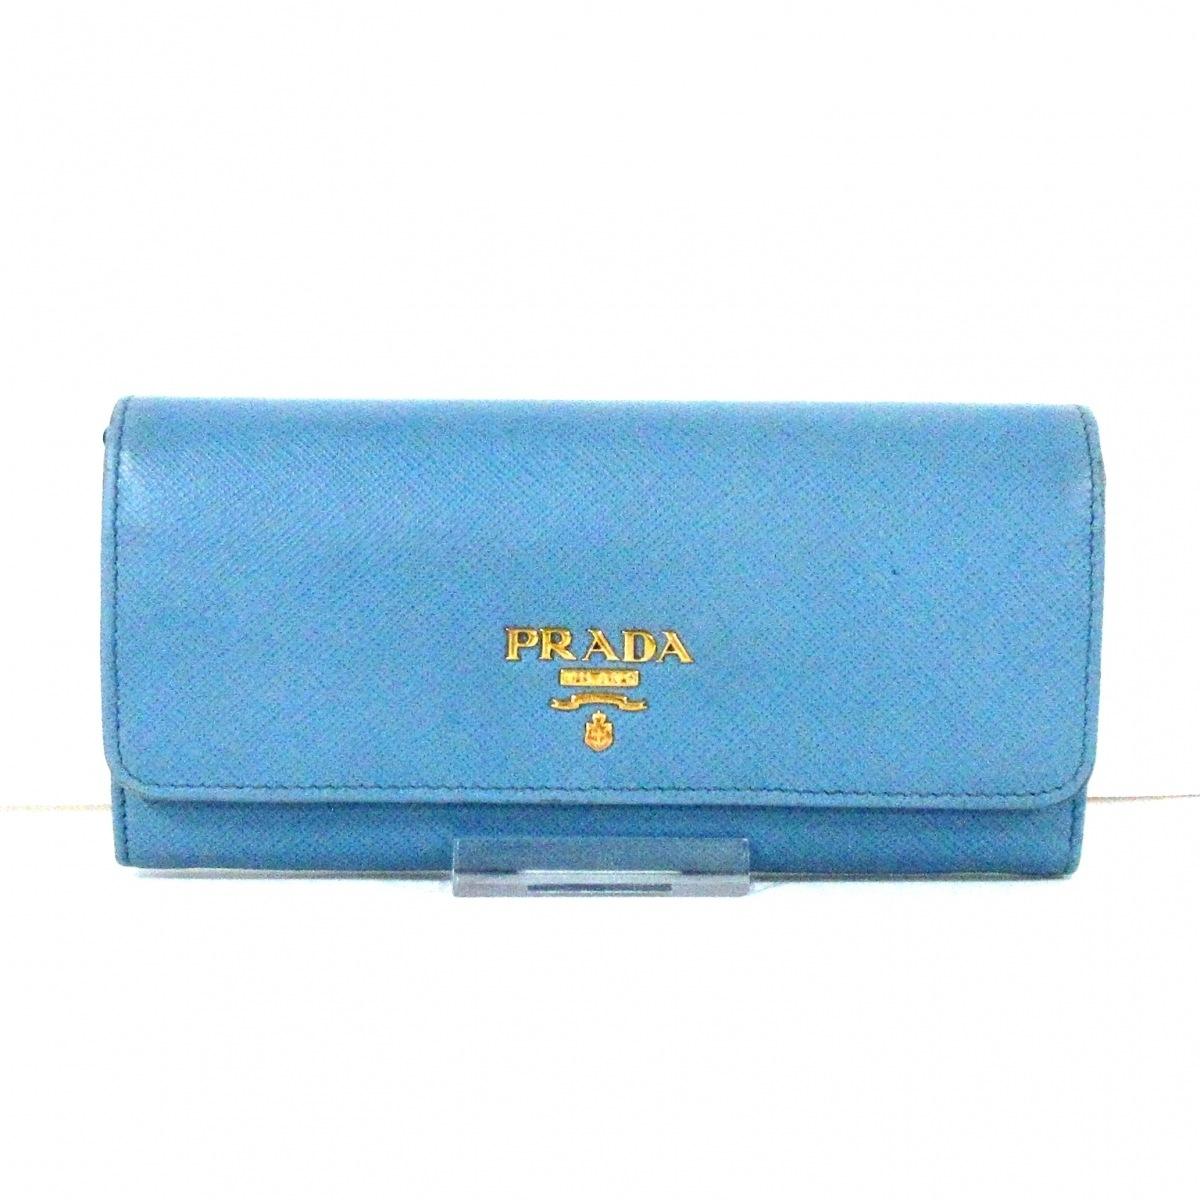 PRADA プラダ 長財布 - サフィアーノレザー 1MH132 ライトブルー 営業 安心の定価販売 中古